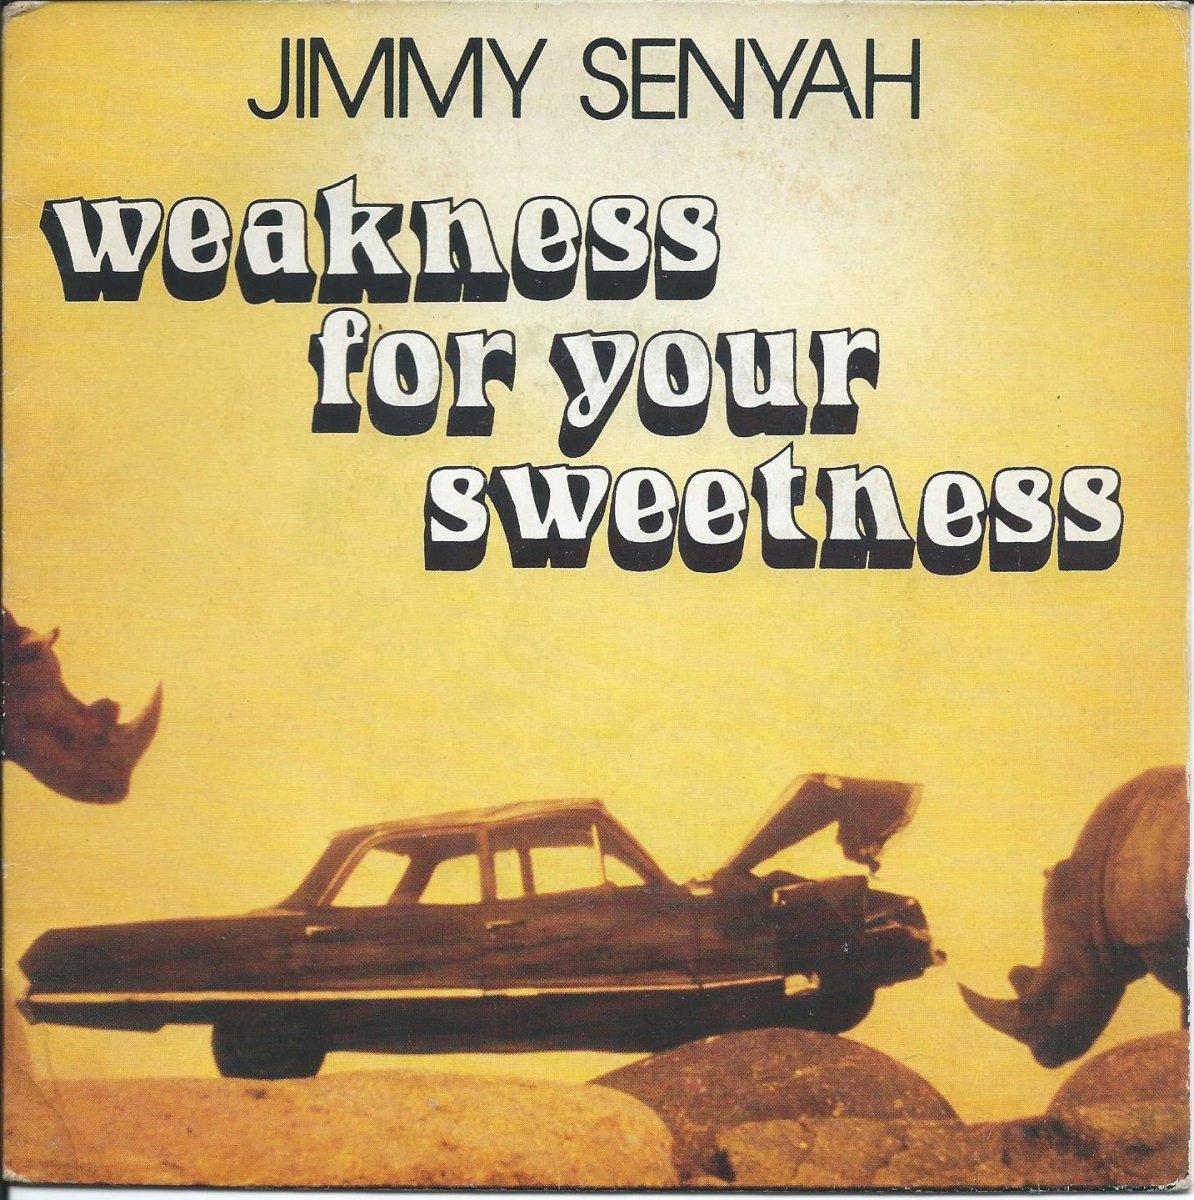 JIMMY SENYAH / WEAKNESS FOR YOUR SWEETNESS (7